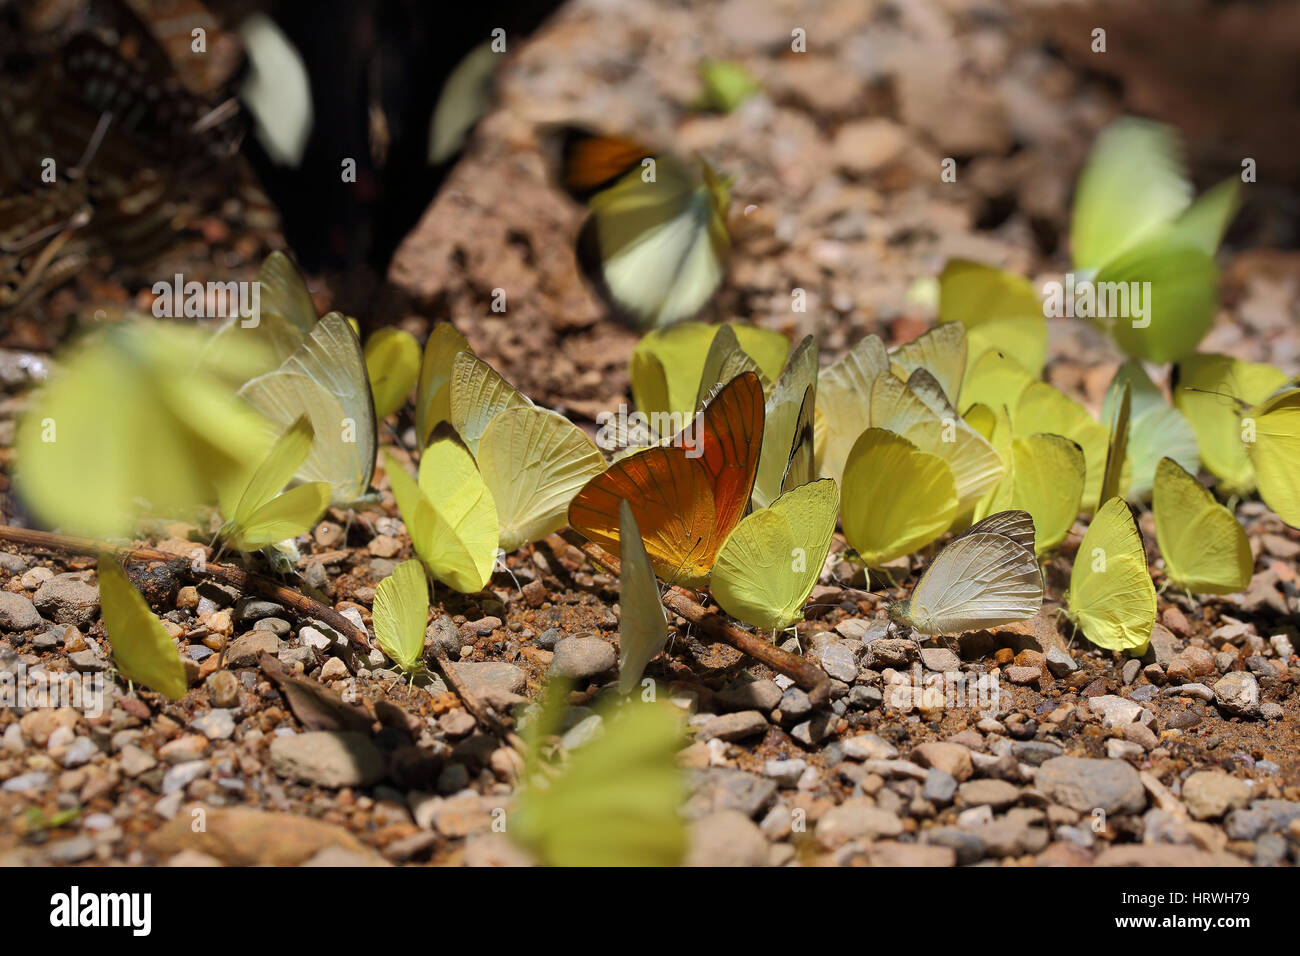 El enfoque selectivo de batterflys amarillo sobre fondo de naturaleza abstracta. Foto de stock